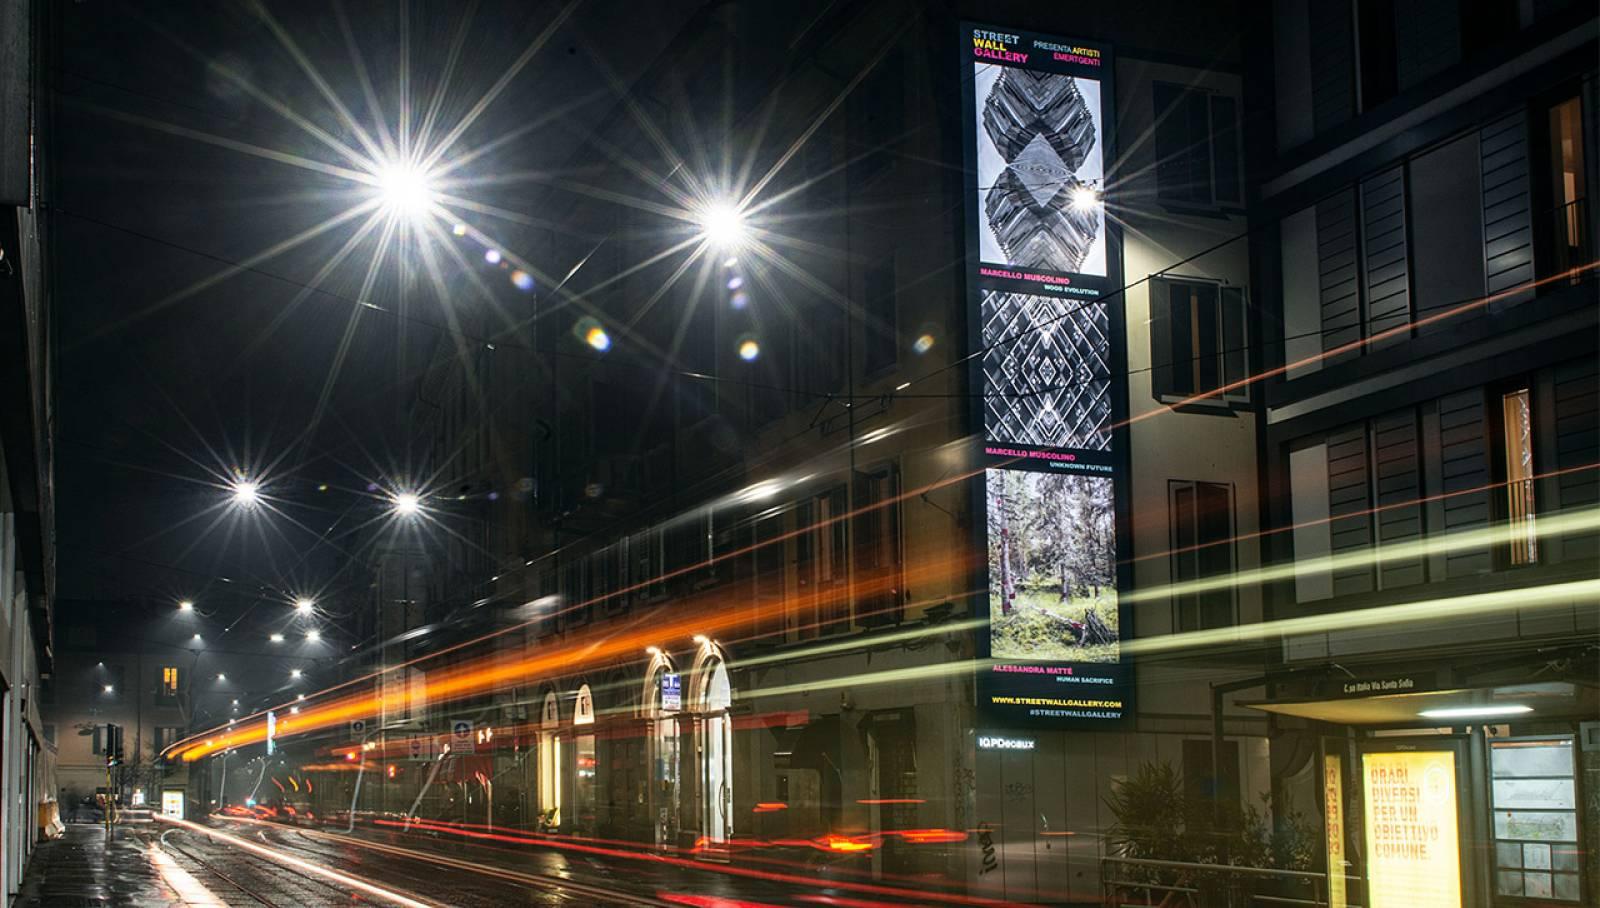 IGPDecaux OOH Milano impianto per Street Wall Gallery